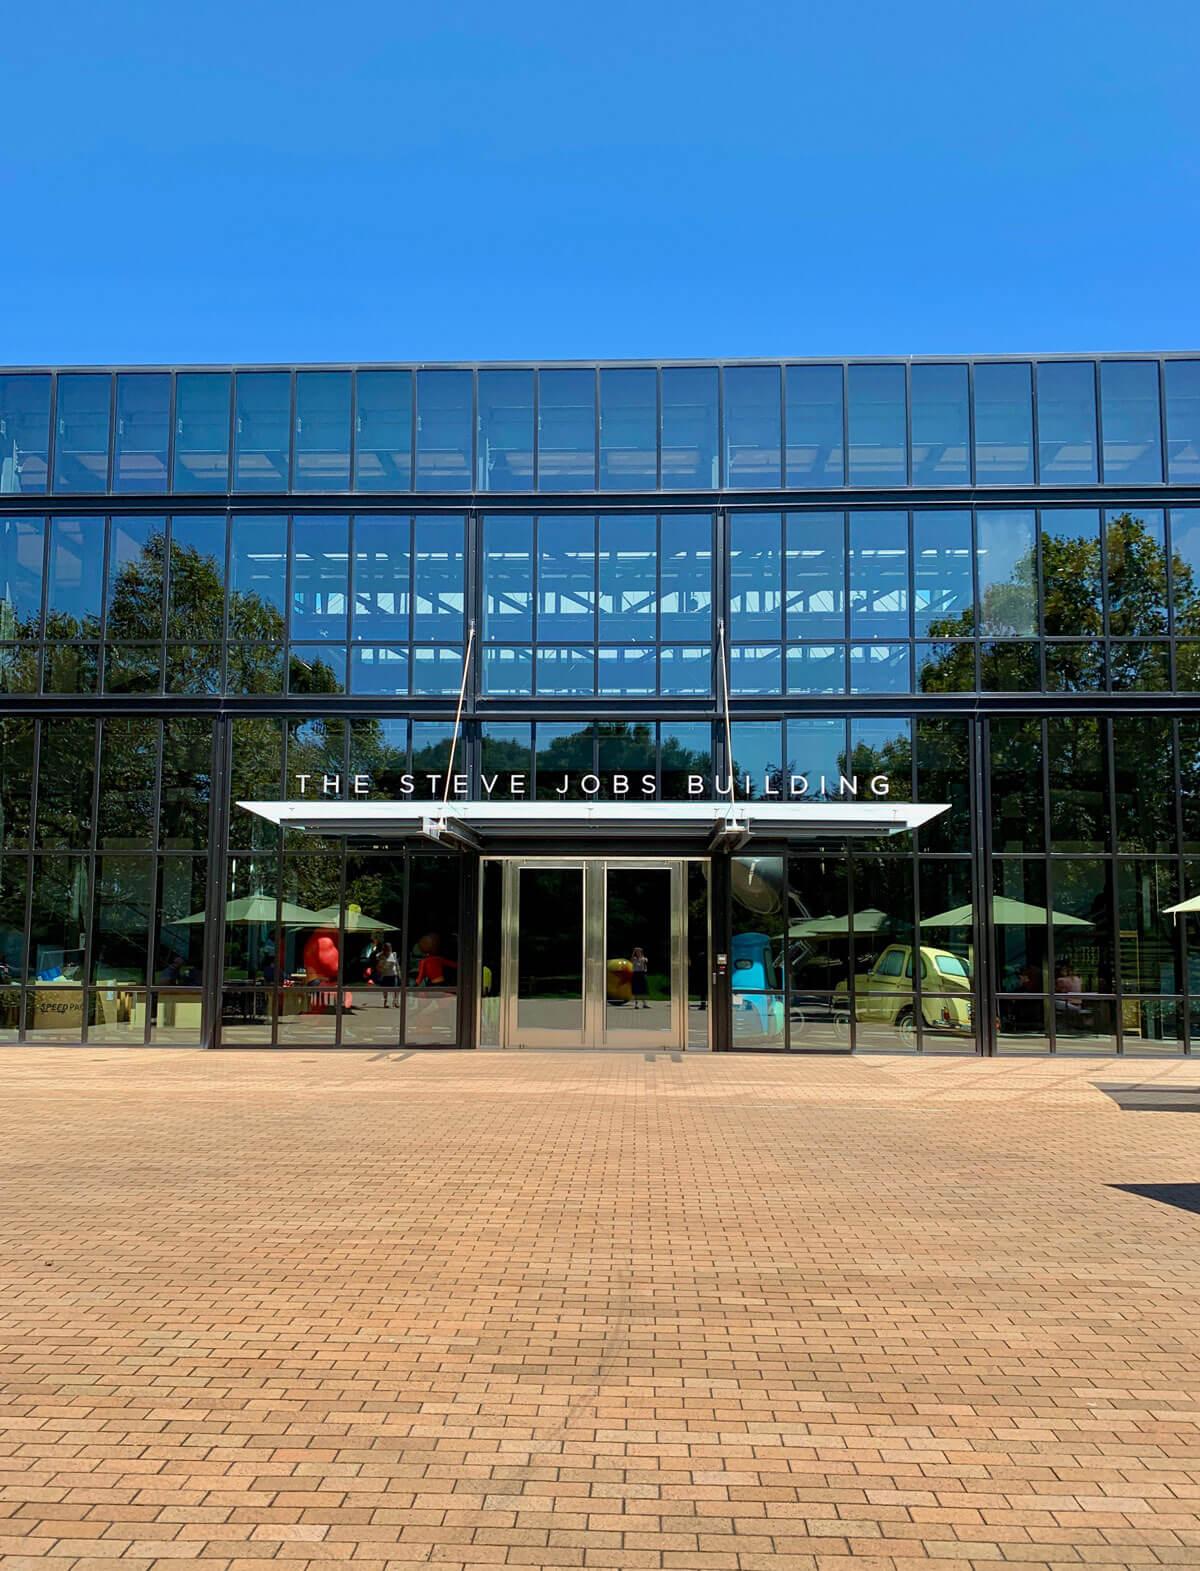 Steve Jobs Building bei Pixar